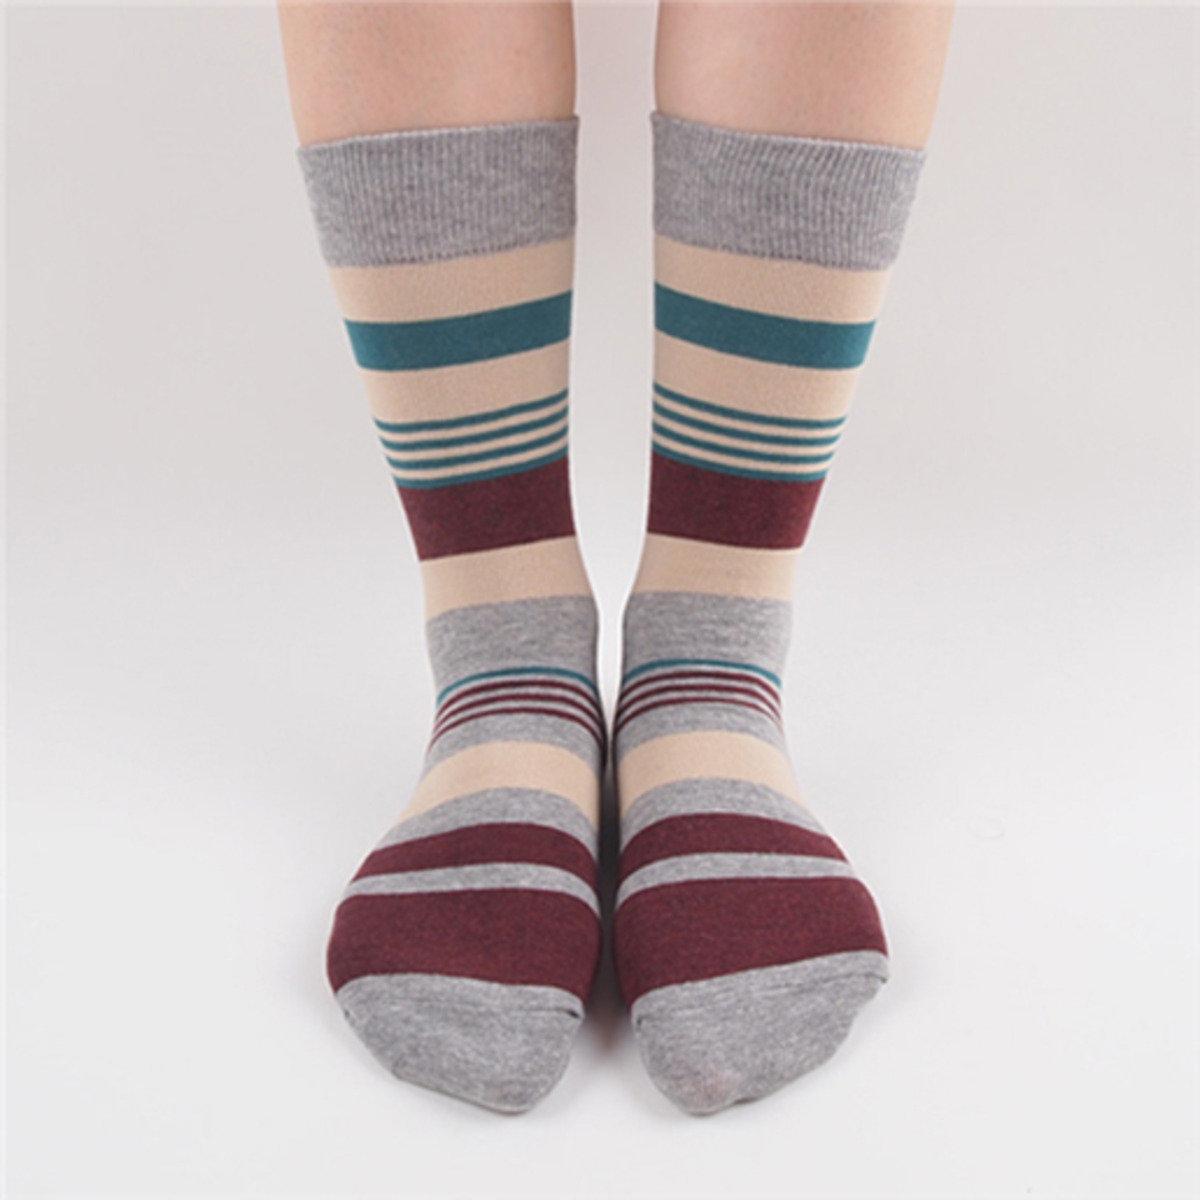 Cardiff 中筒襪_socks_13025